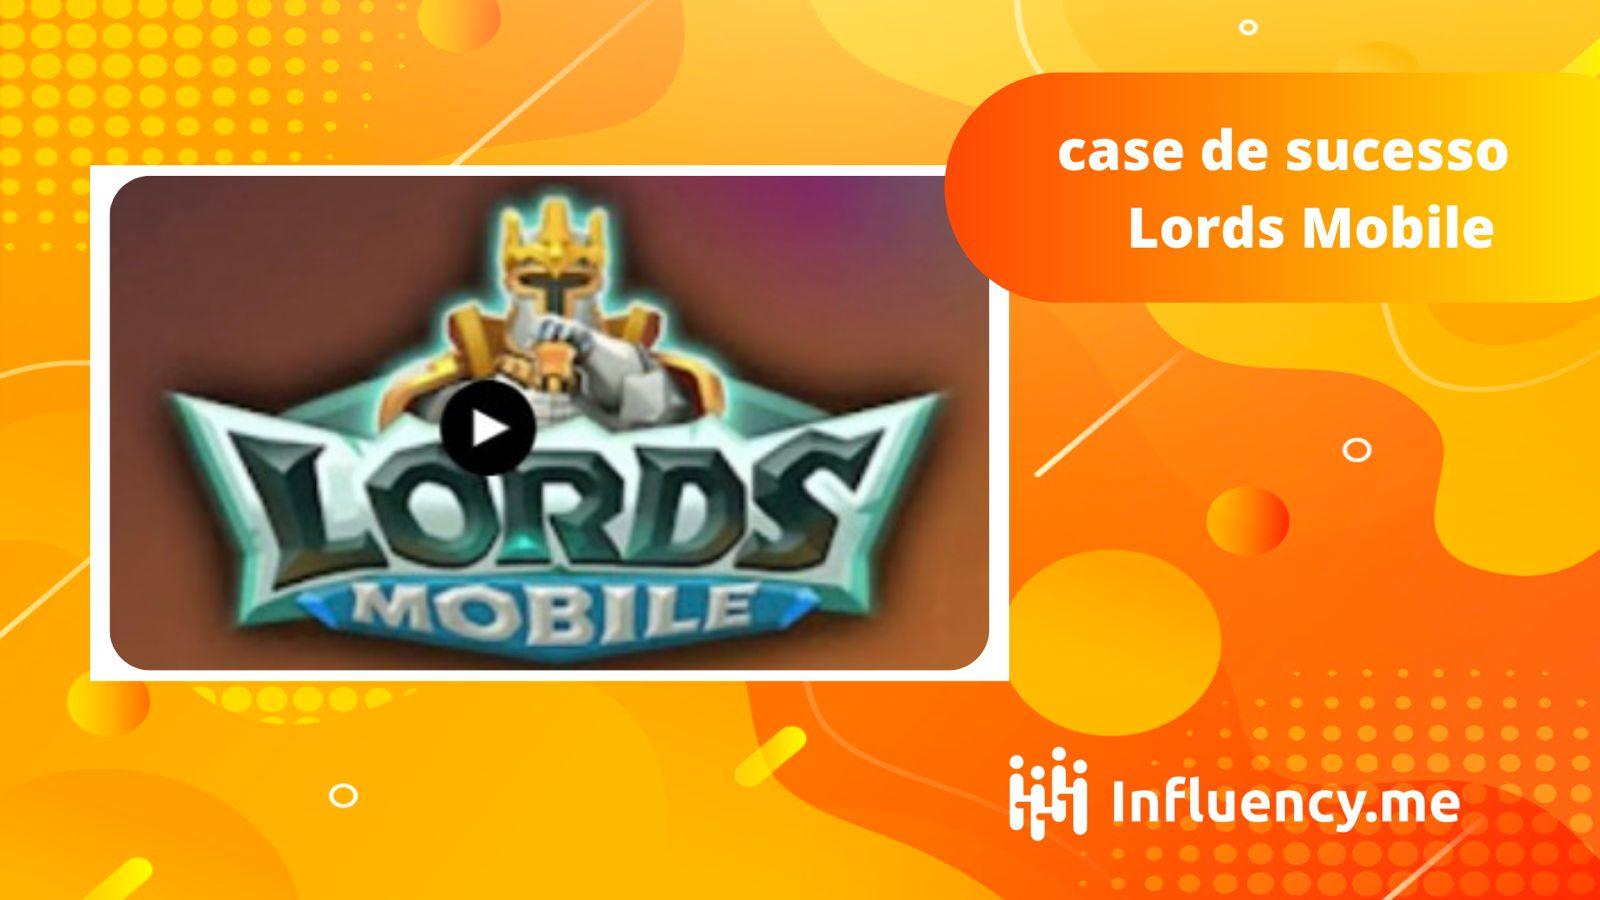 case de sucesso lords mobile